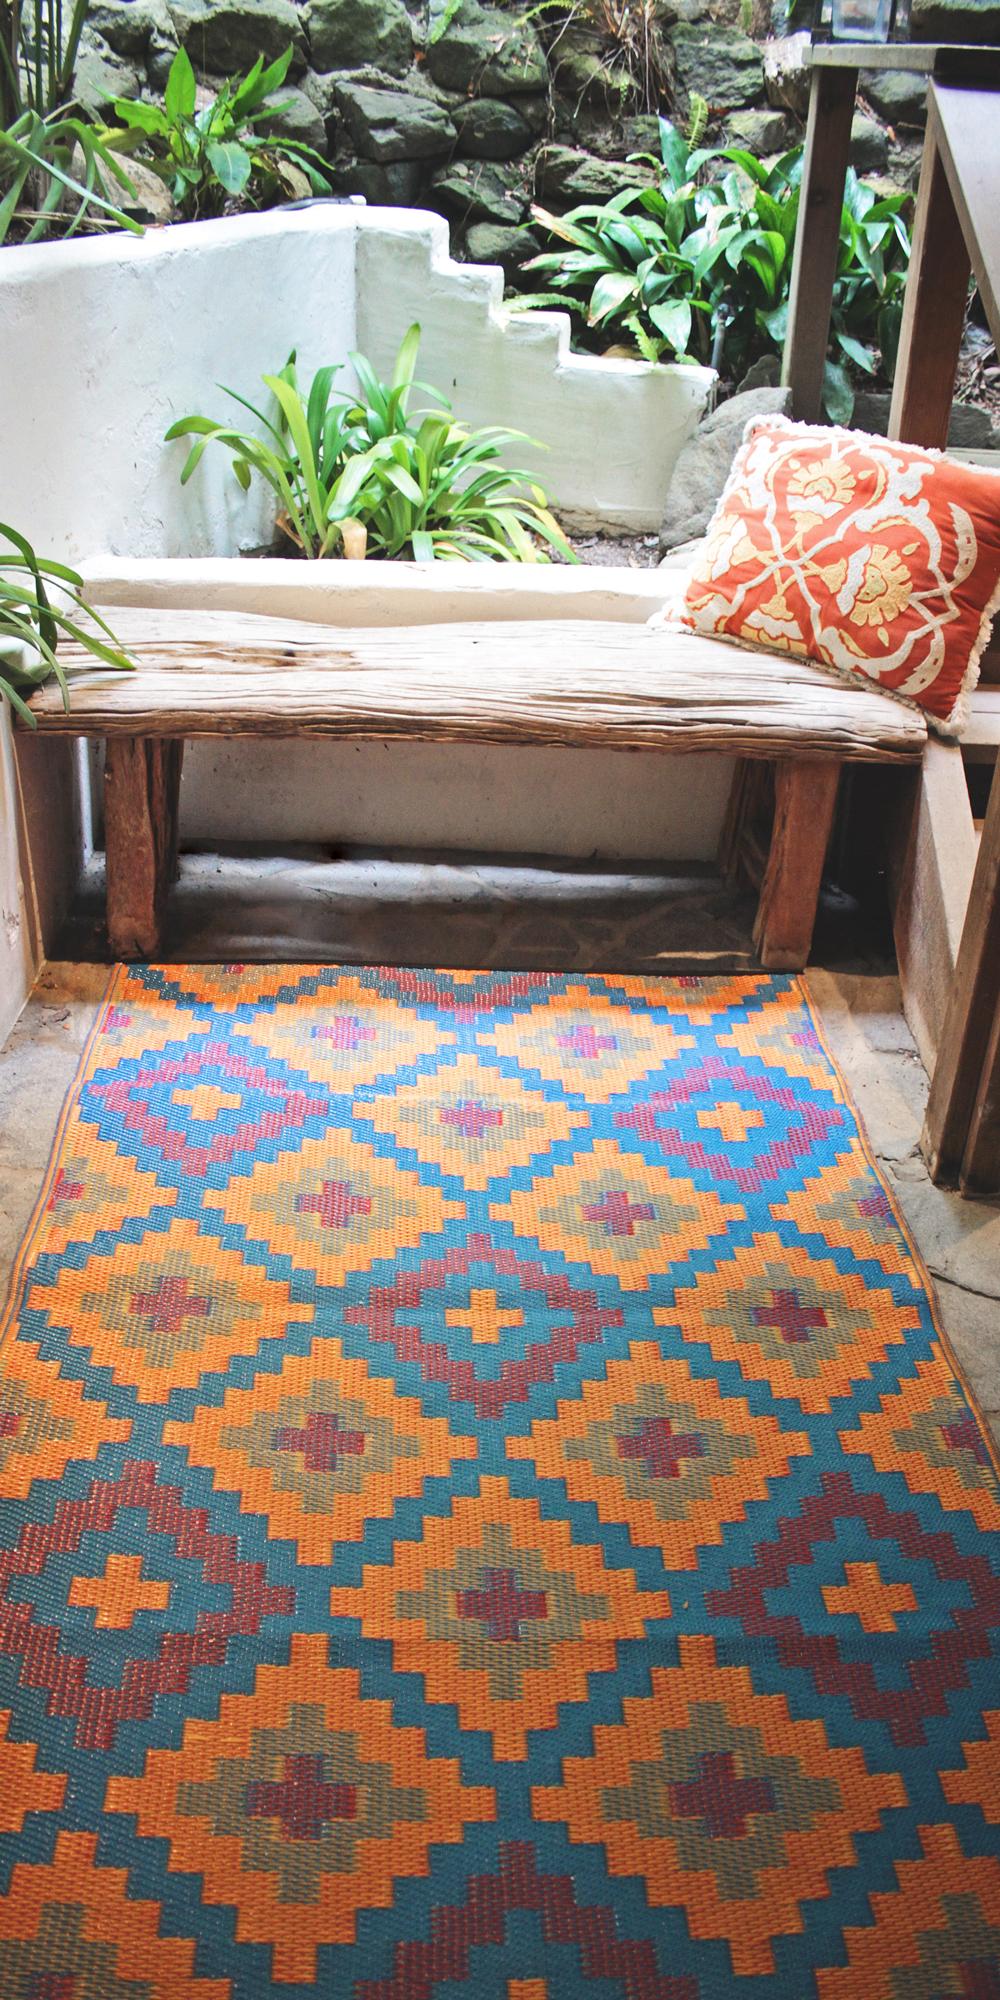 35 Beautiful Rugs Ideas And Design For Livingroom Blue Outdoor Rug Outdoor Plastic Rug Outdoor Rugs Patio